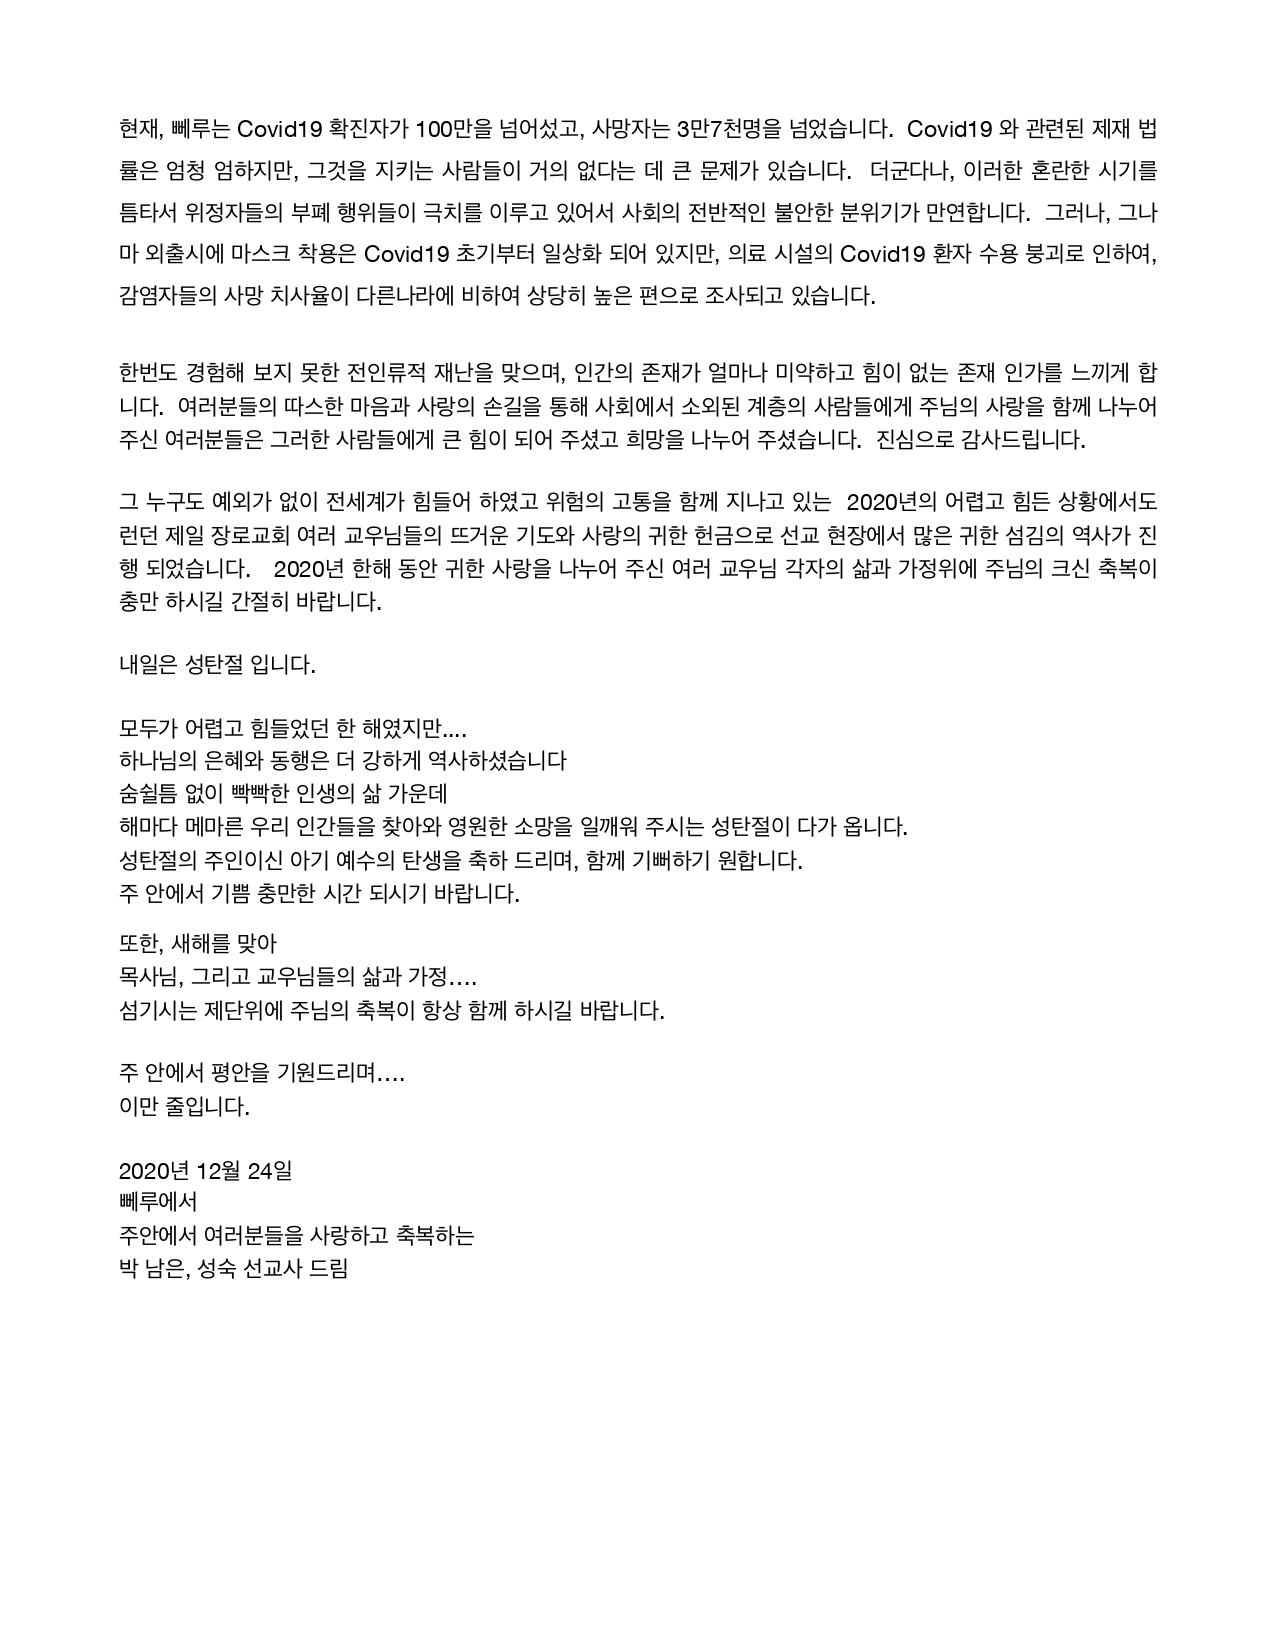 MR-Newsletter 201224런던_page-0005.jpg